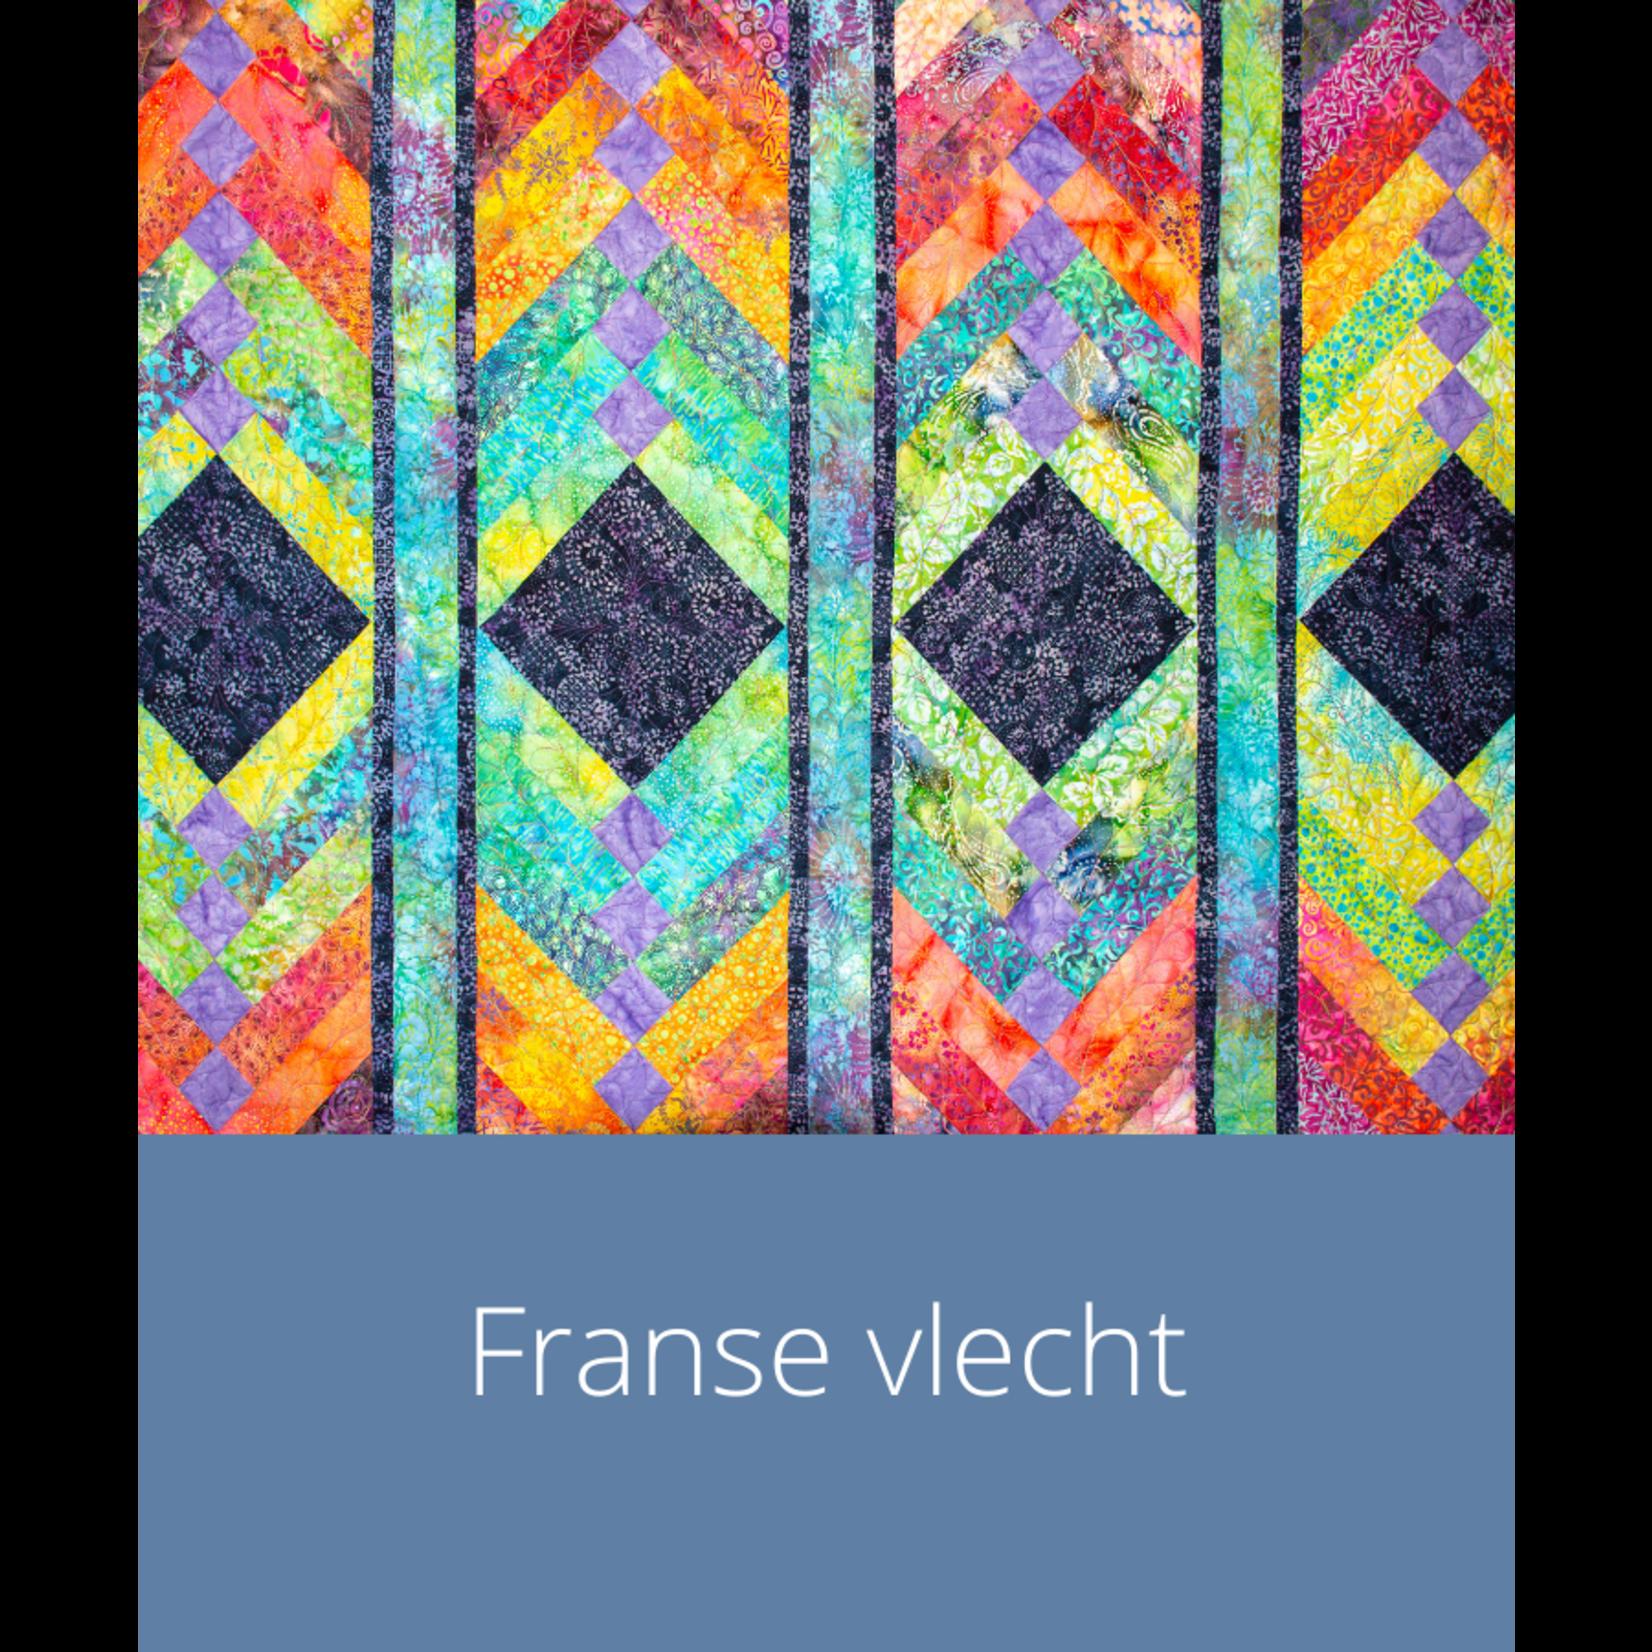 Cursus - Franse vlecht | donderdag 9 december